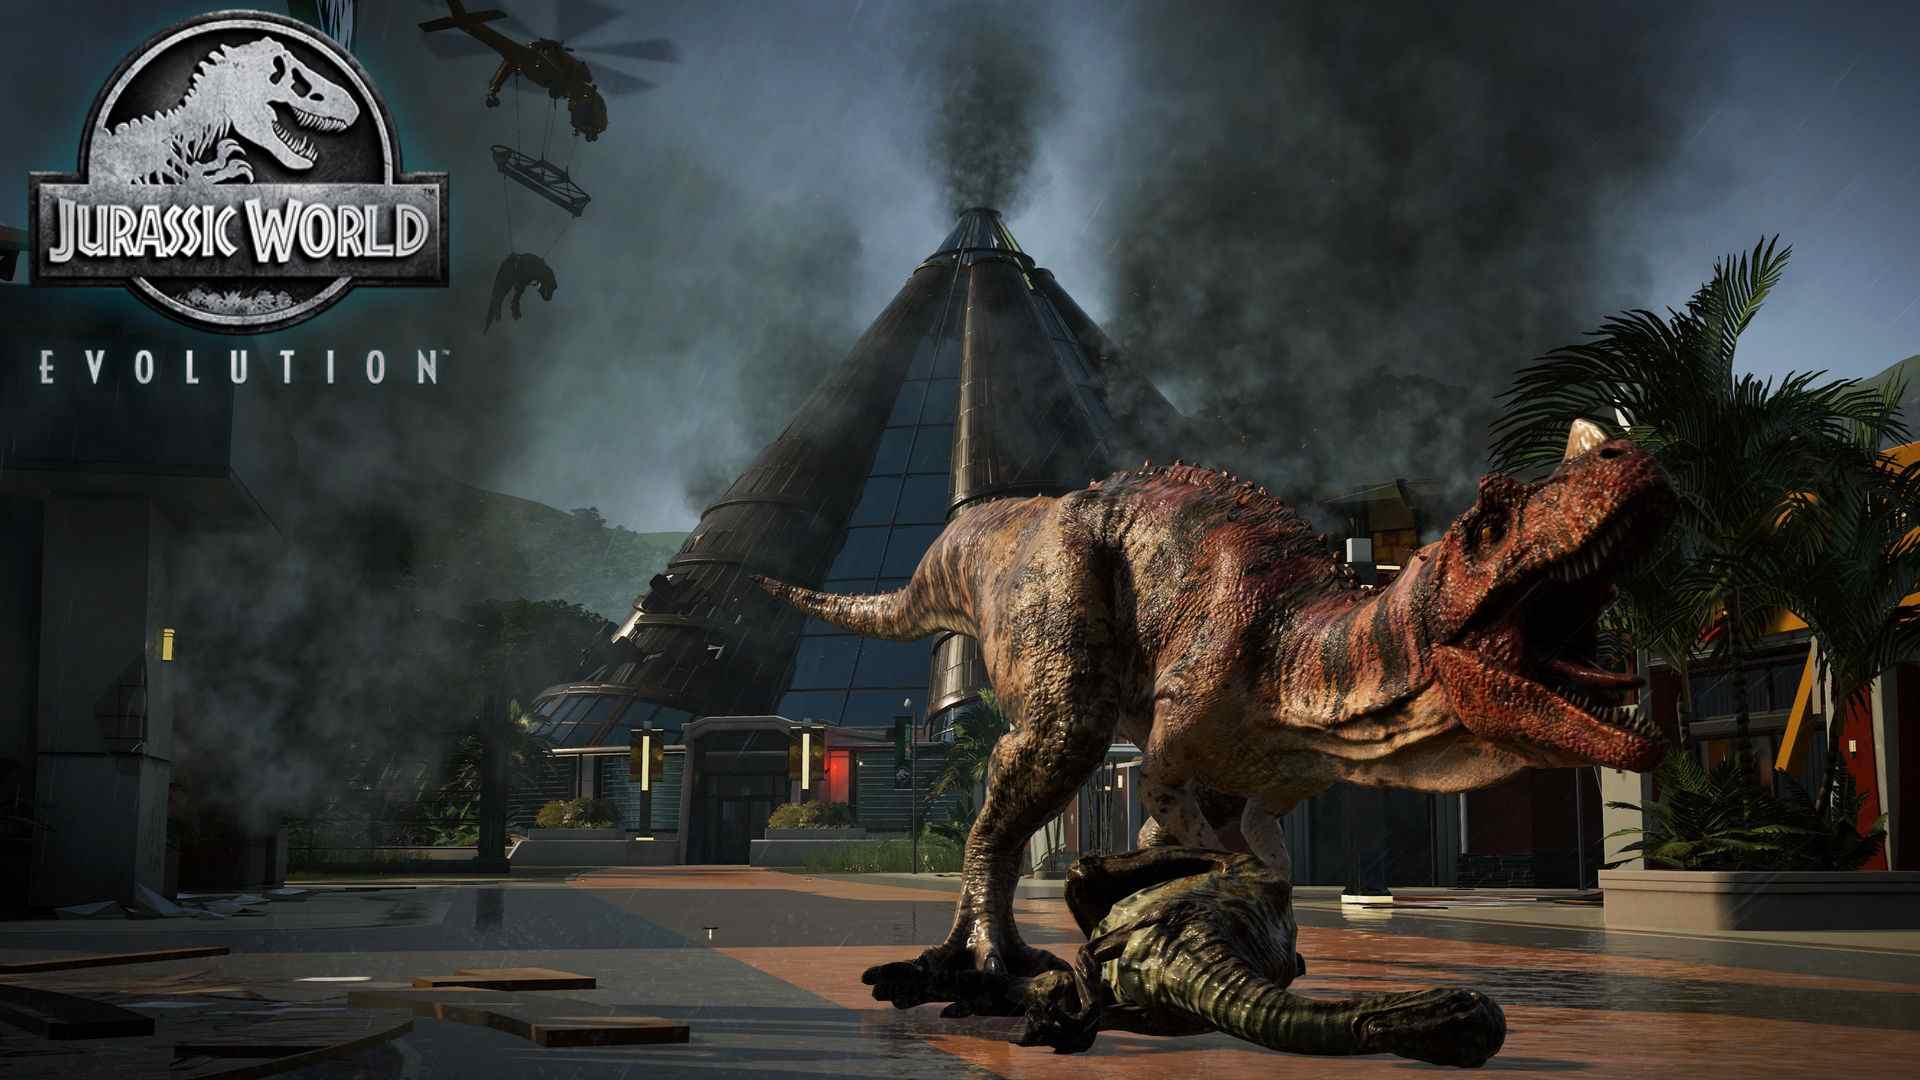 Critique Vidéo : Jurassic World Evolution